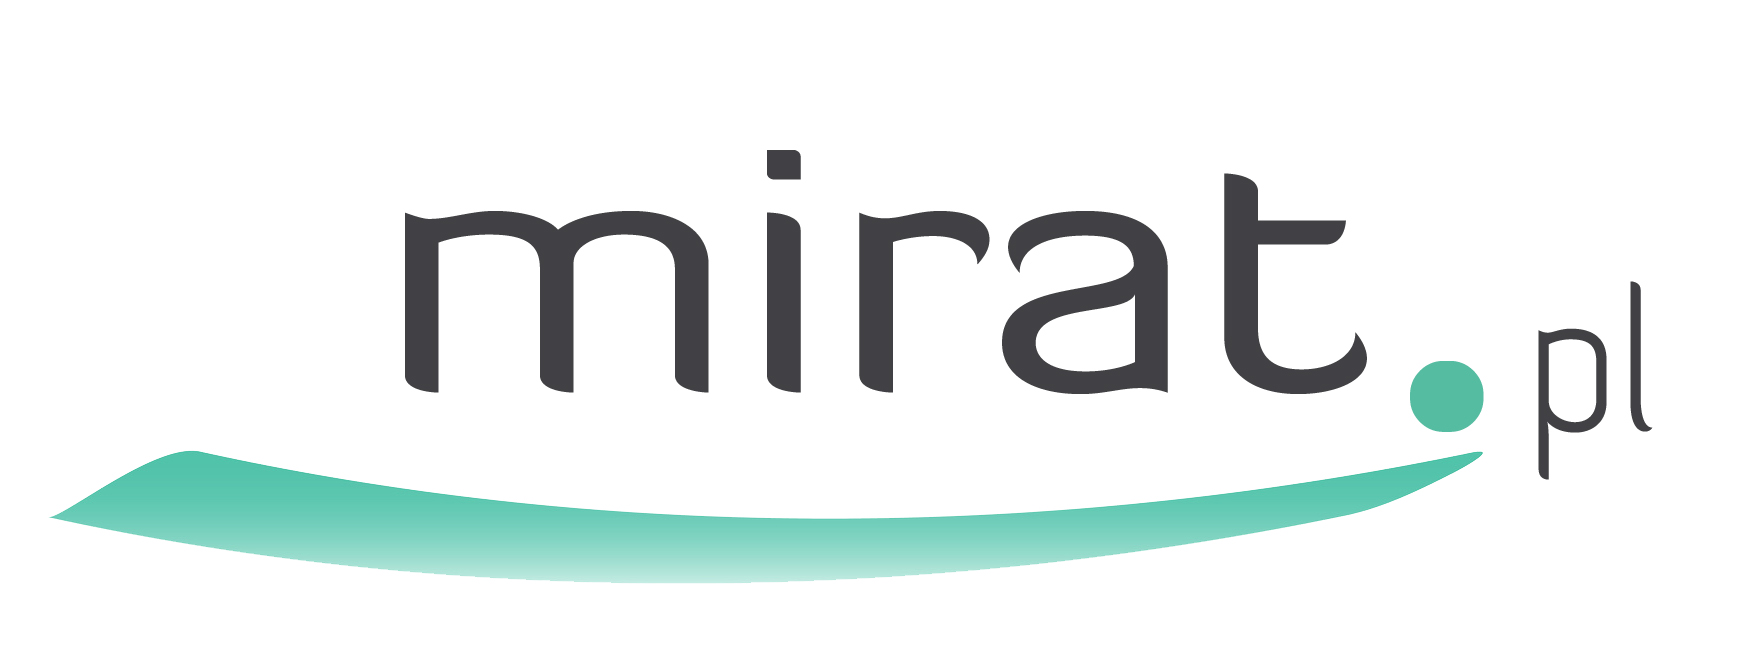 logo podstawowe kopia